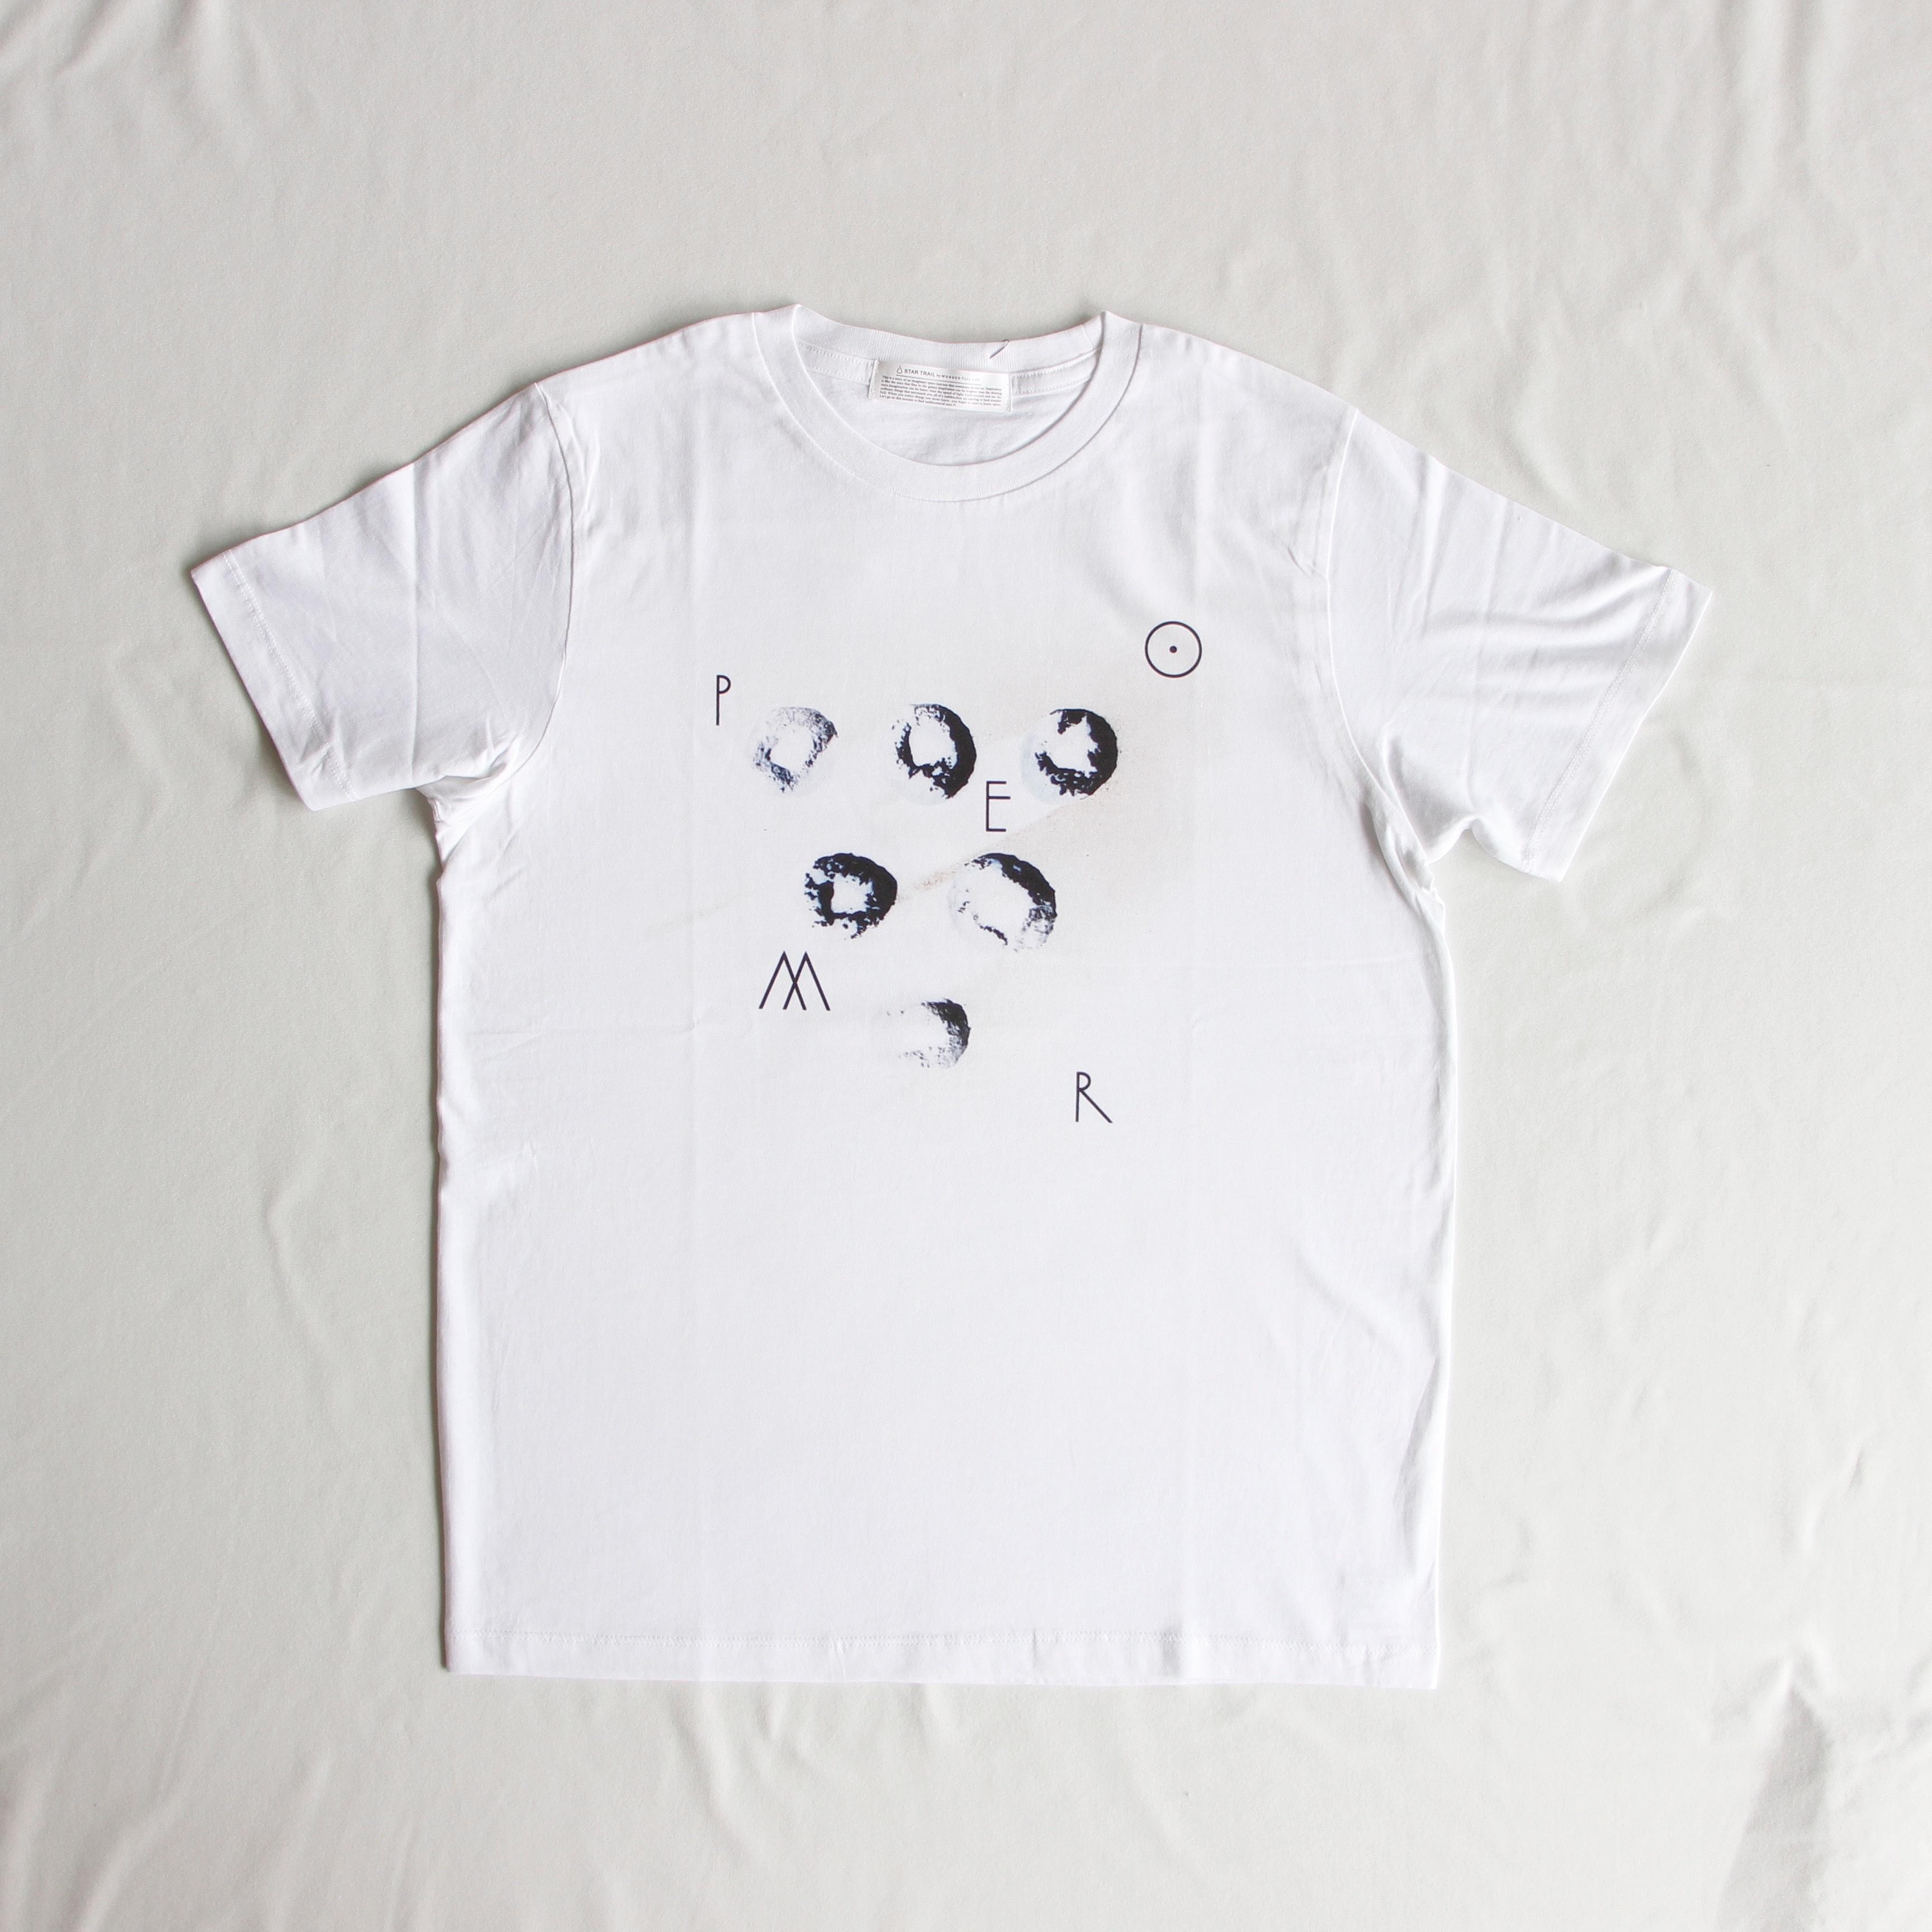 《WONDER FULL LIFE 》STAR TRAIL T-SHIRTS / CIRCLE / M(大人)